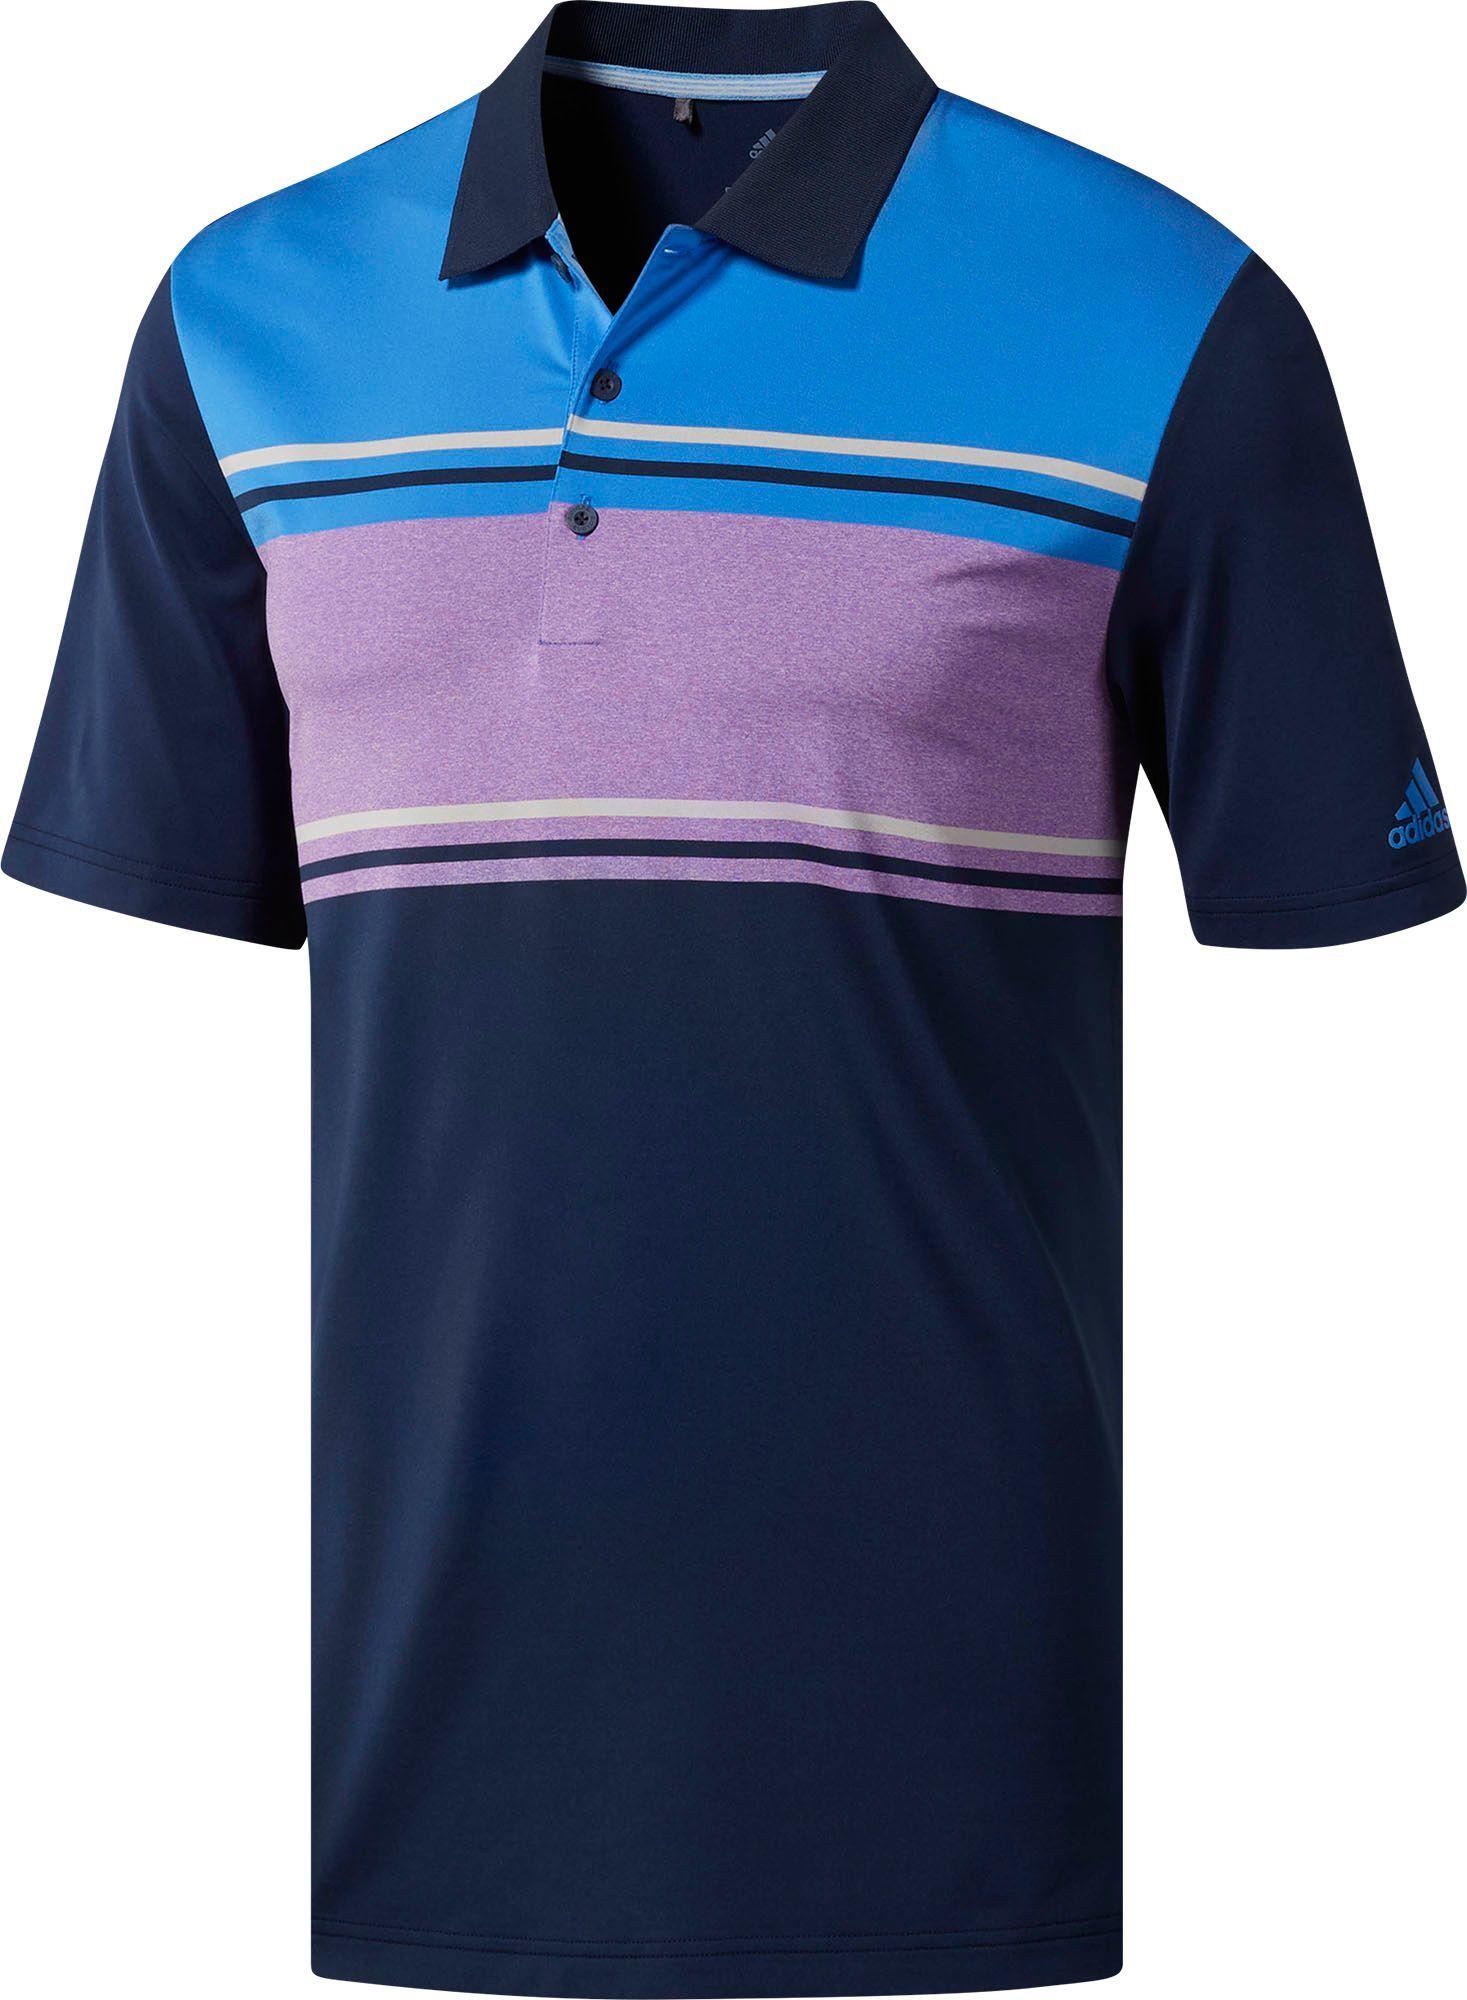 san francisco a84b4 41cb3 adidas Men s Ultimate365 Classic Merch Golf Polo, Size  Small, Blue